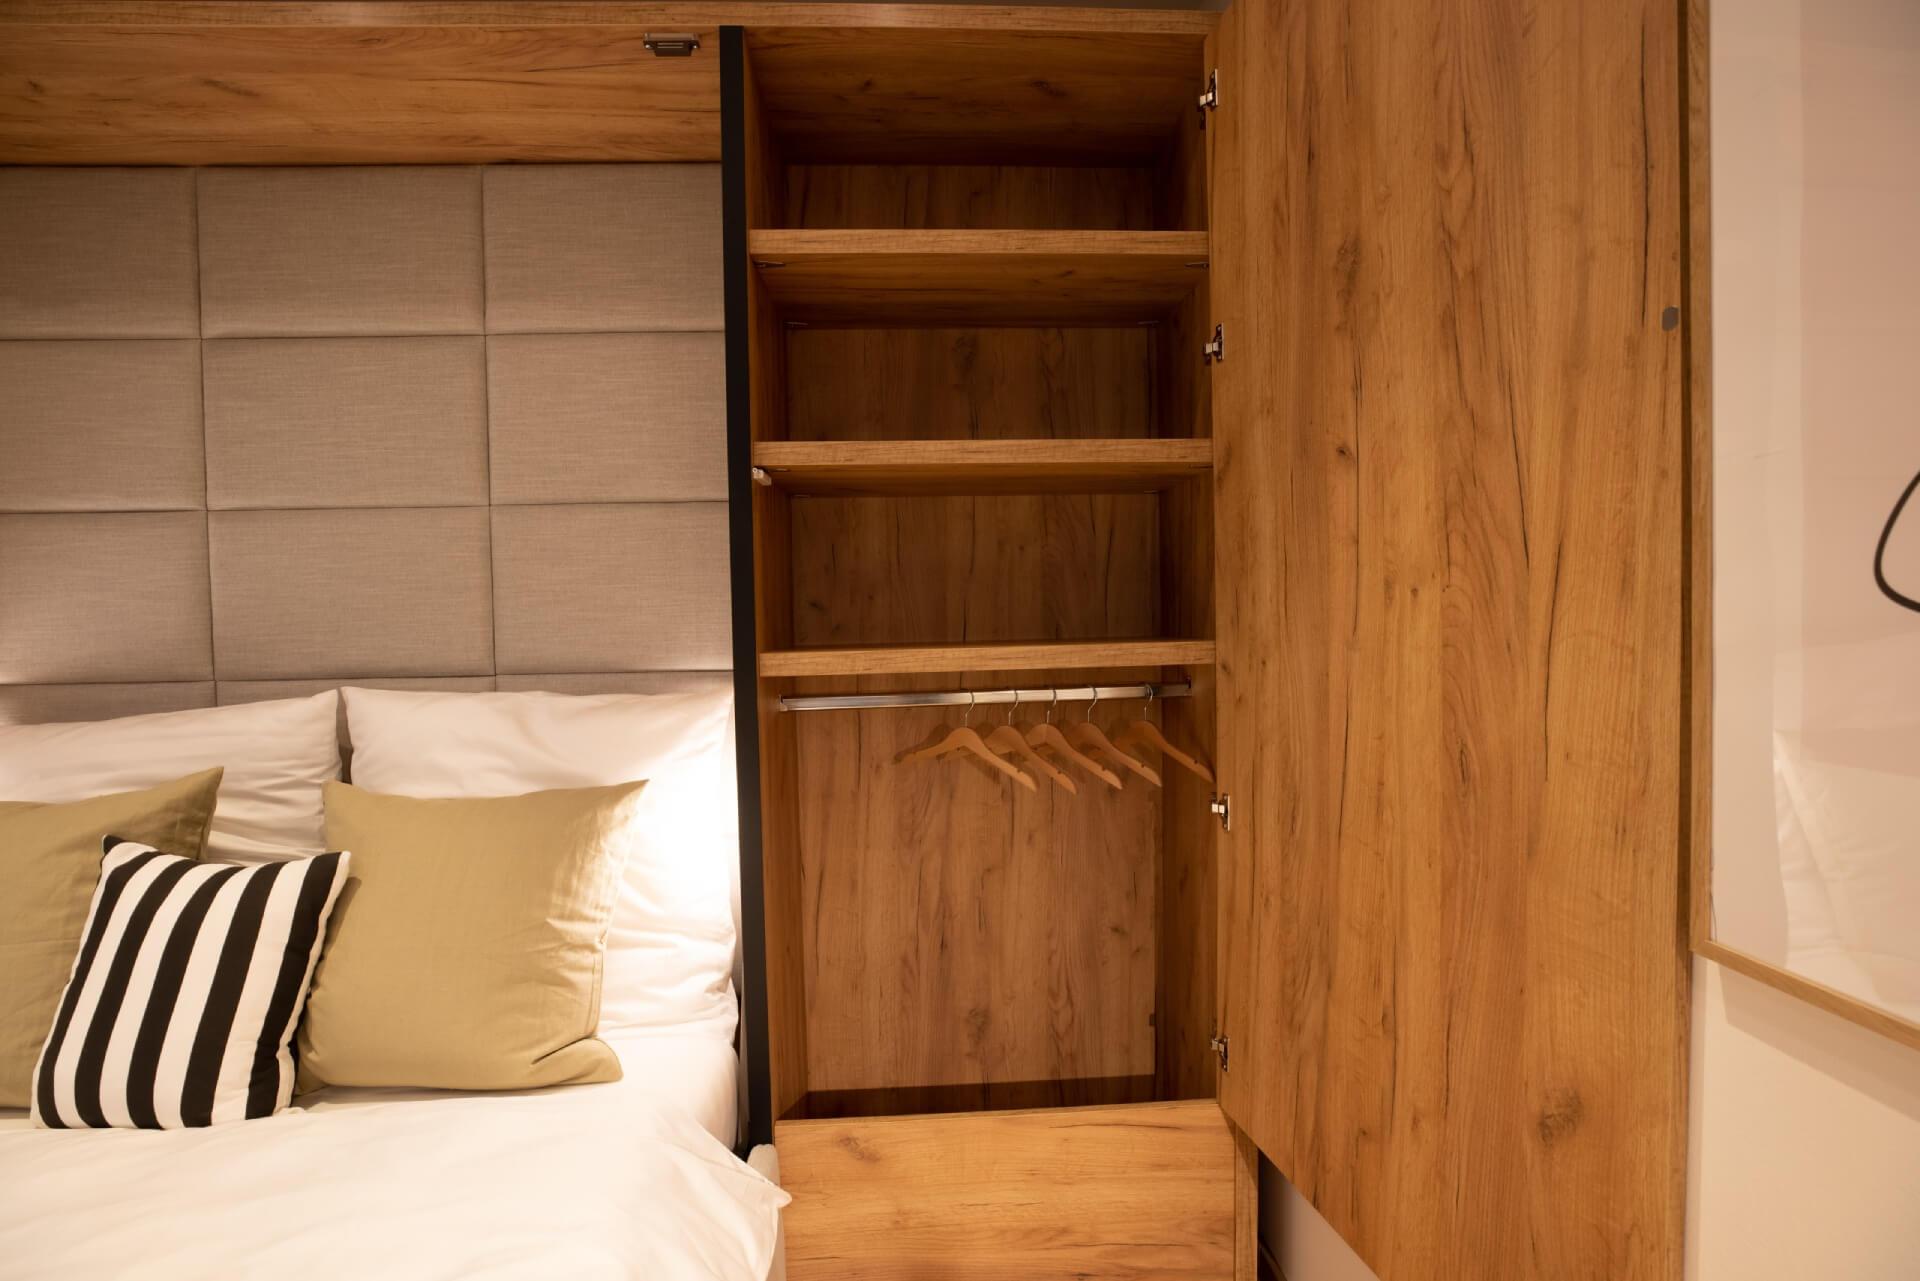 Tiny House BLOXS with BLOXS elements sofa and wardrobe